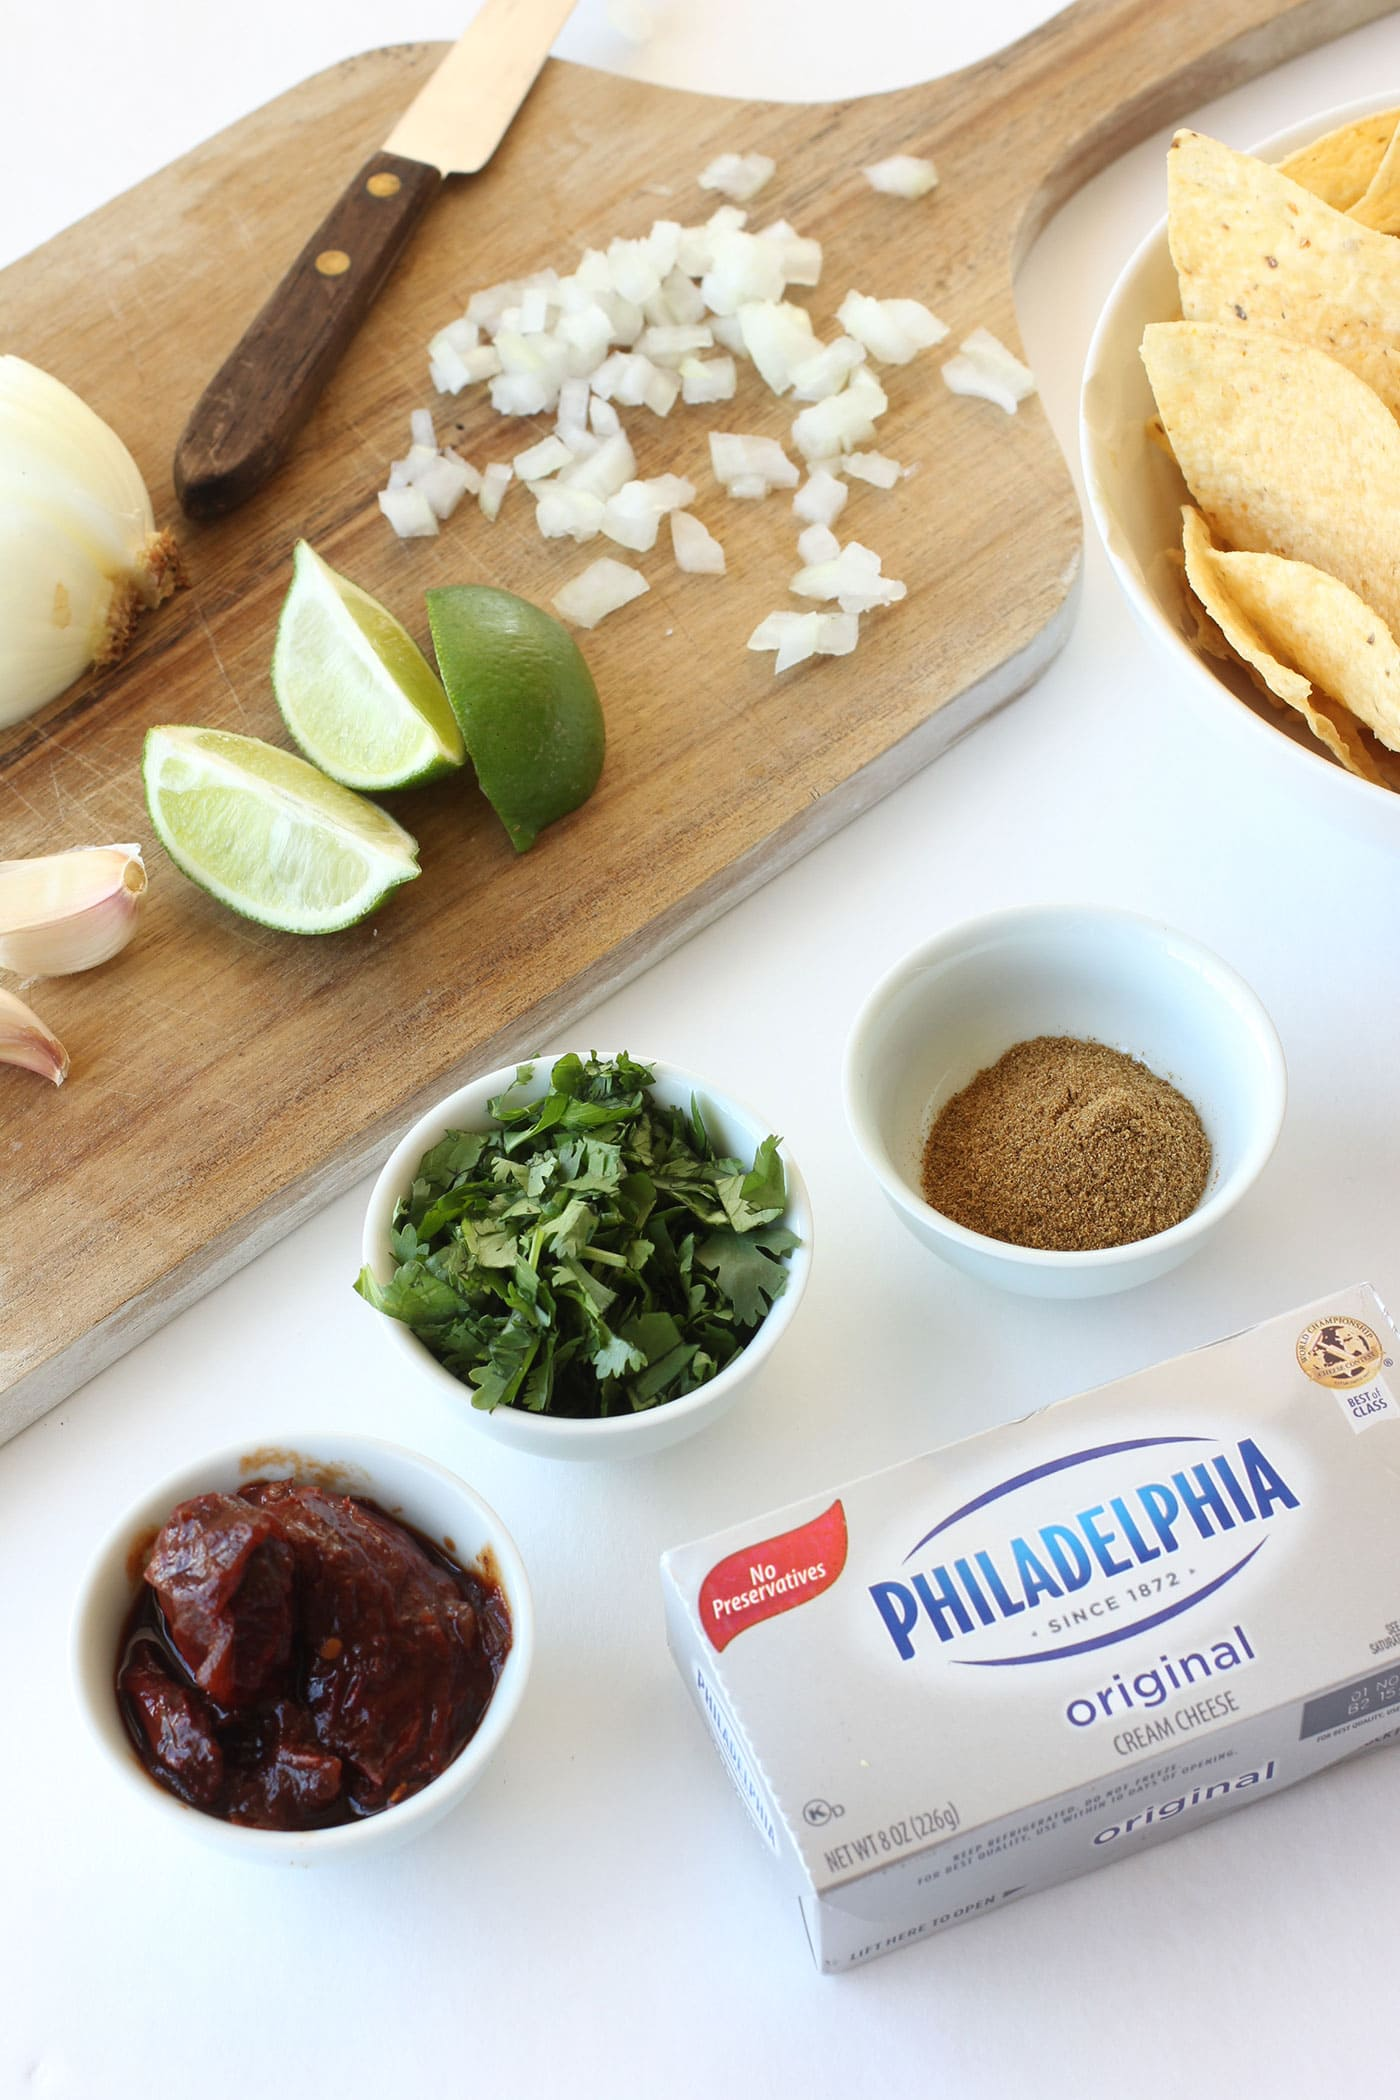 smoke-chipotle-cheese-dip-recipe